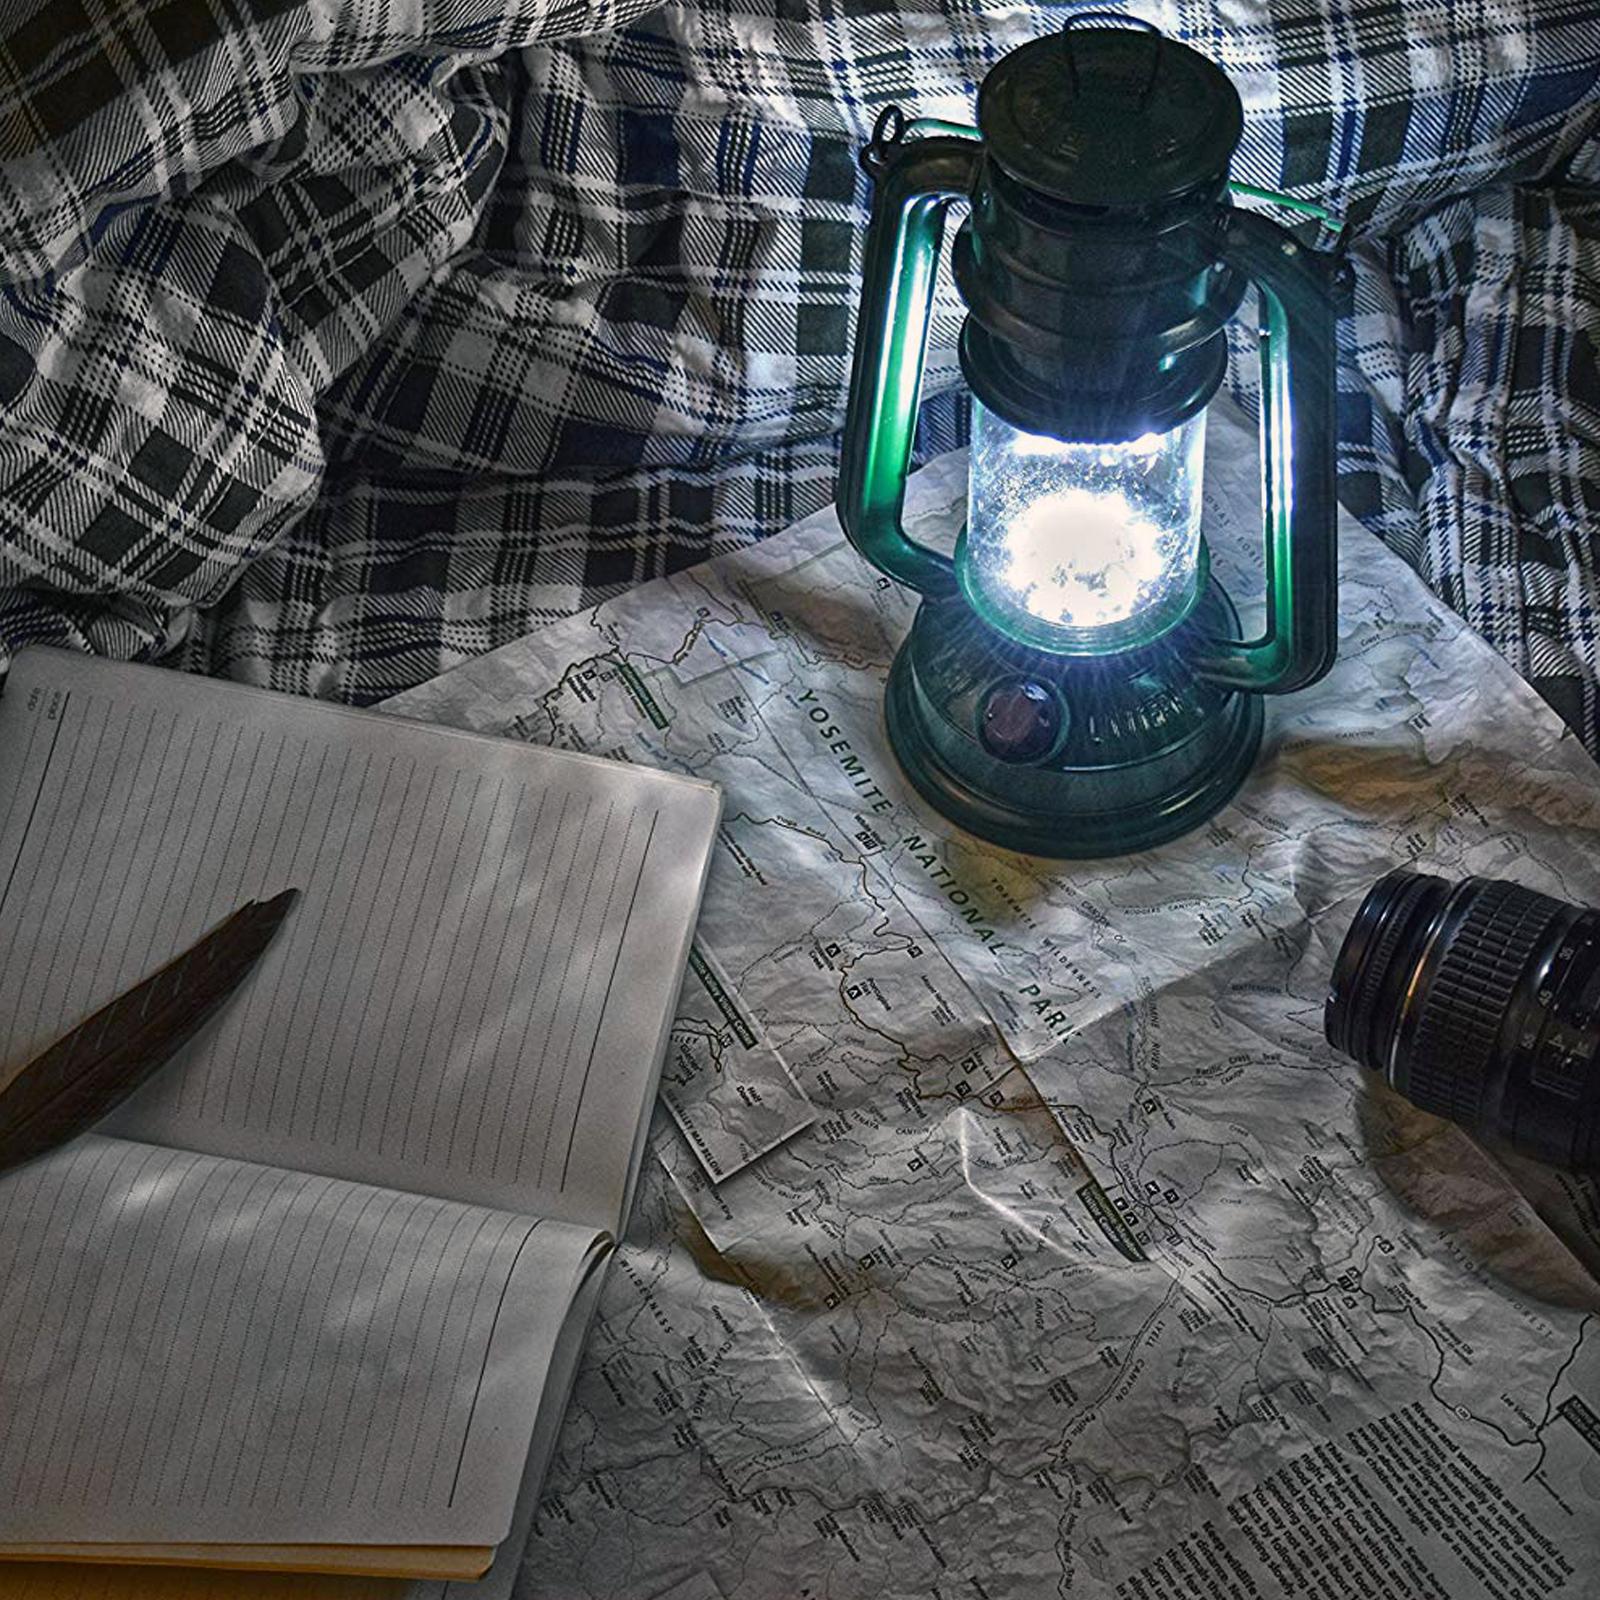 ASR Outdoor 15 LED 9.5 in Hurricane Hanging Lantern Camping Light Green